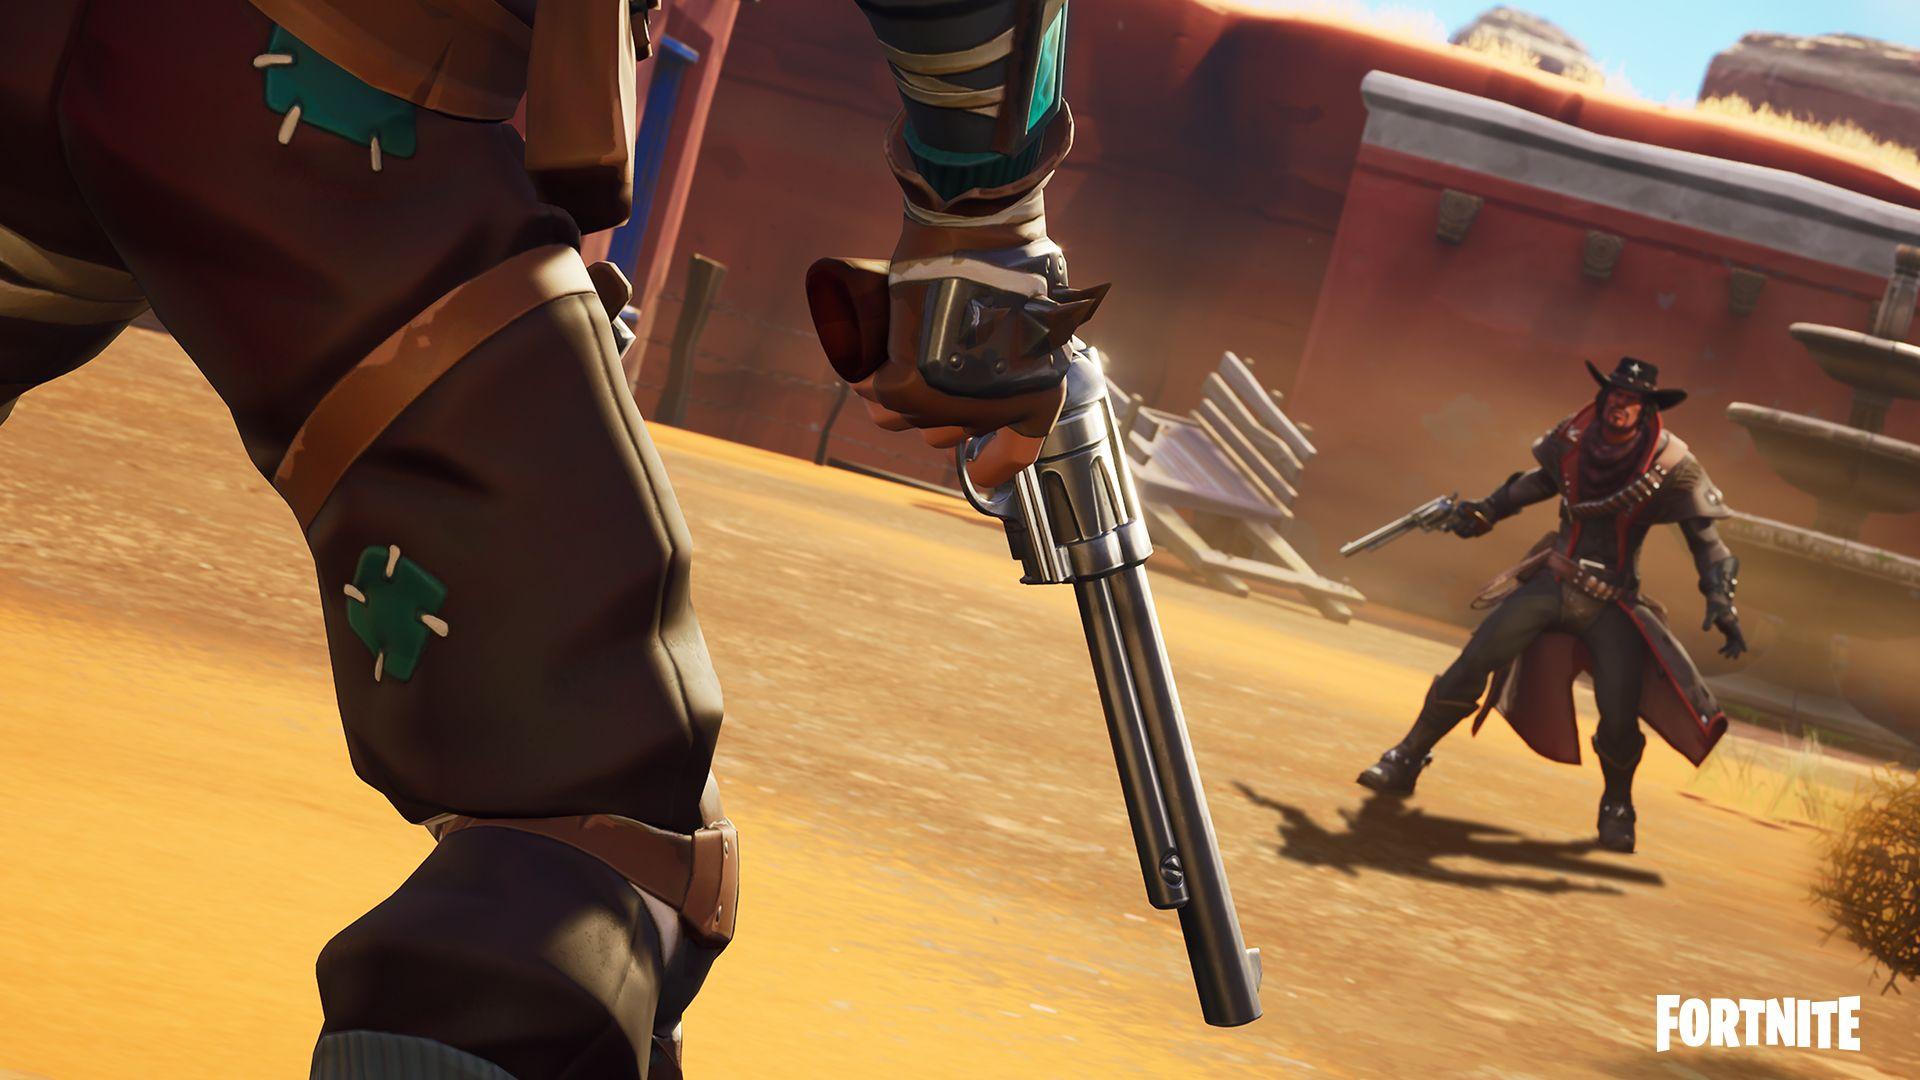 Fortnite Update 6 30 Adds Dynamite Amp Wild West Ltm